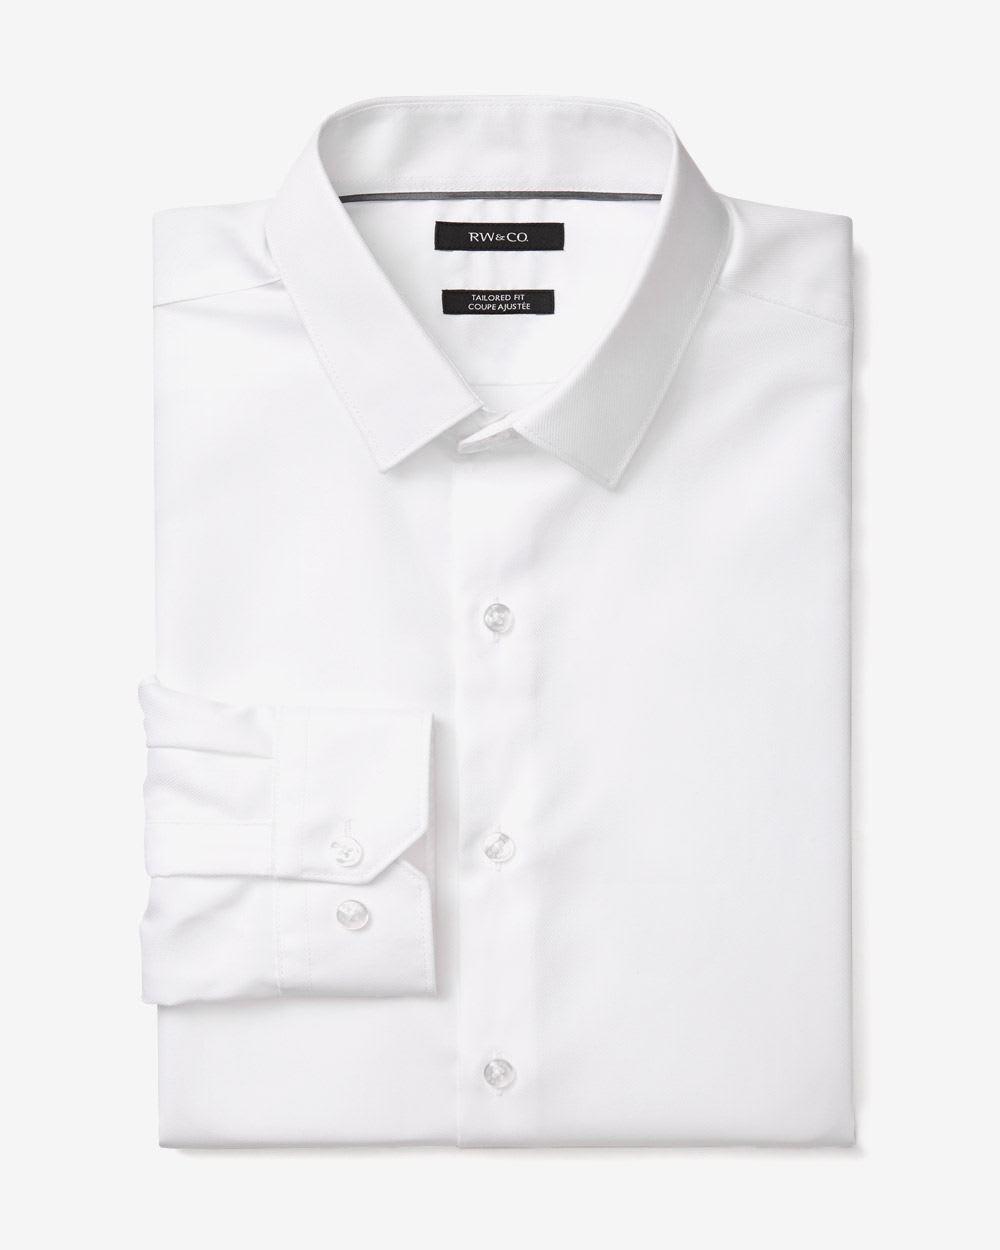 Tailored Fit Dress Shirt Short Rw Co